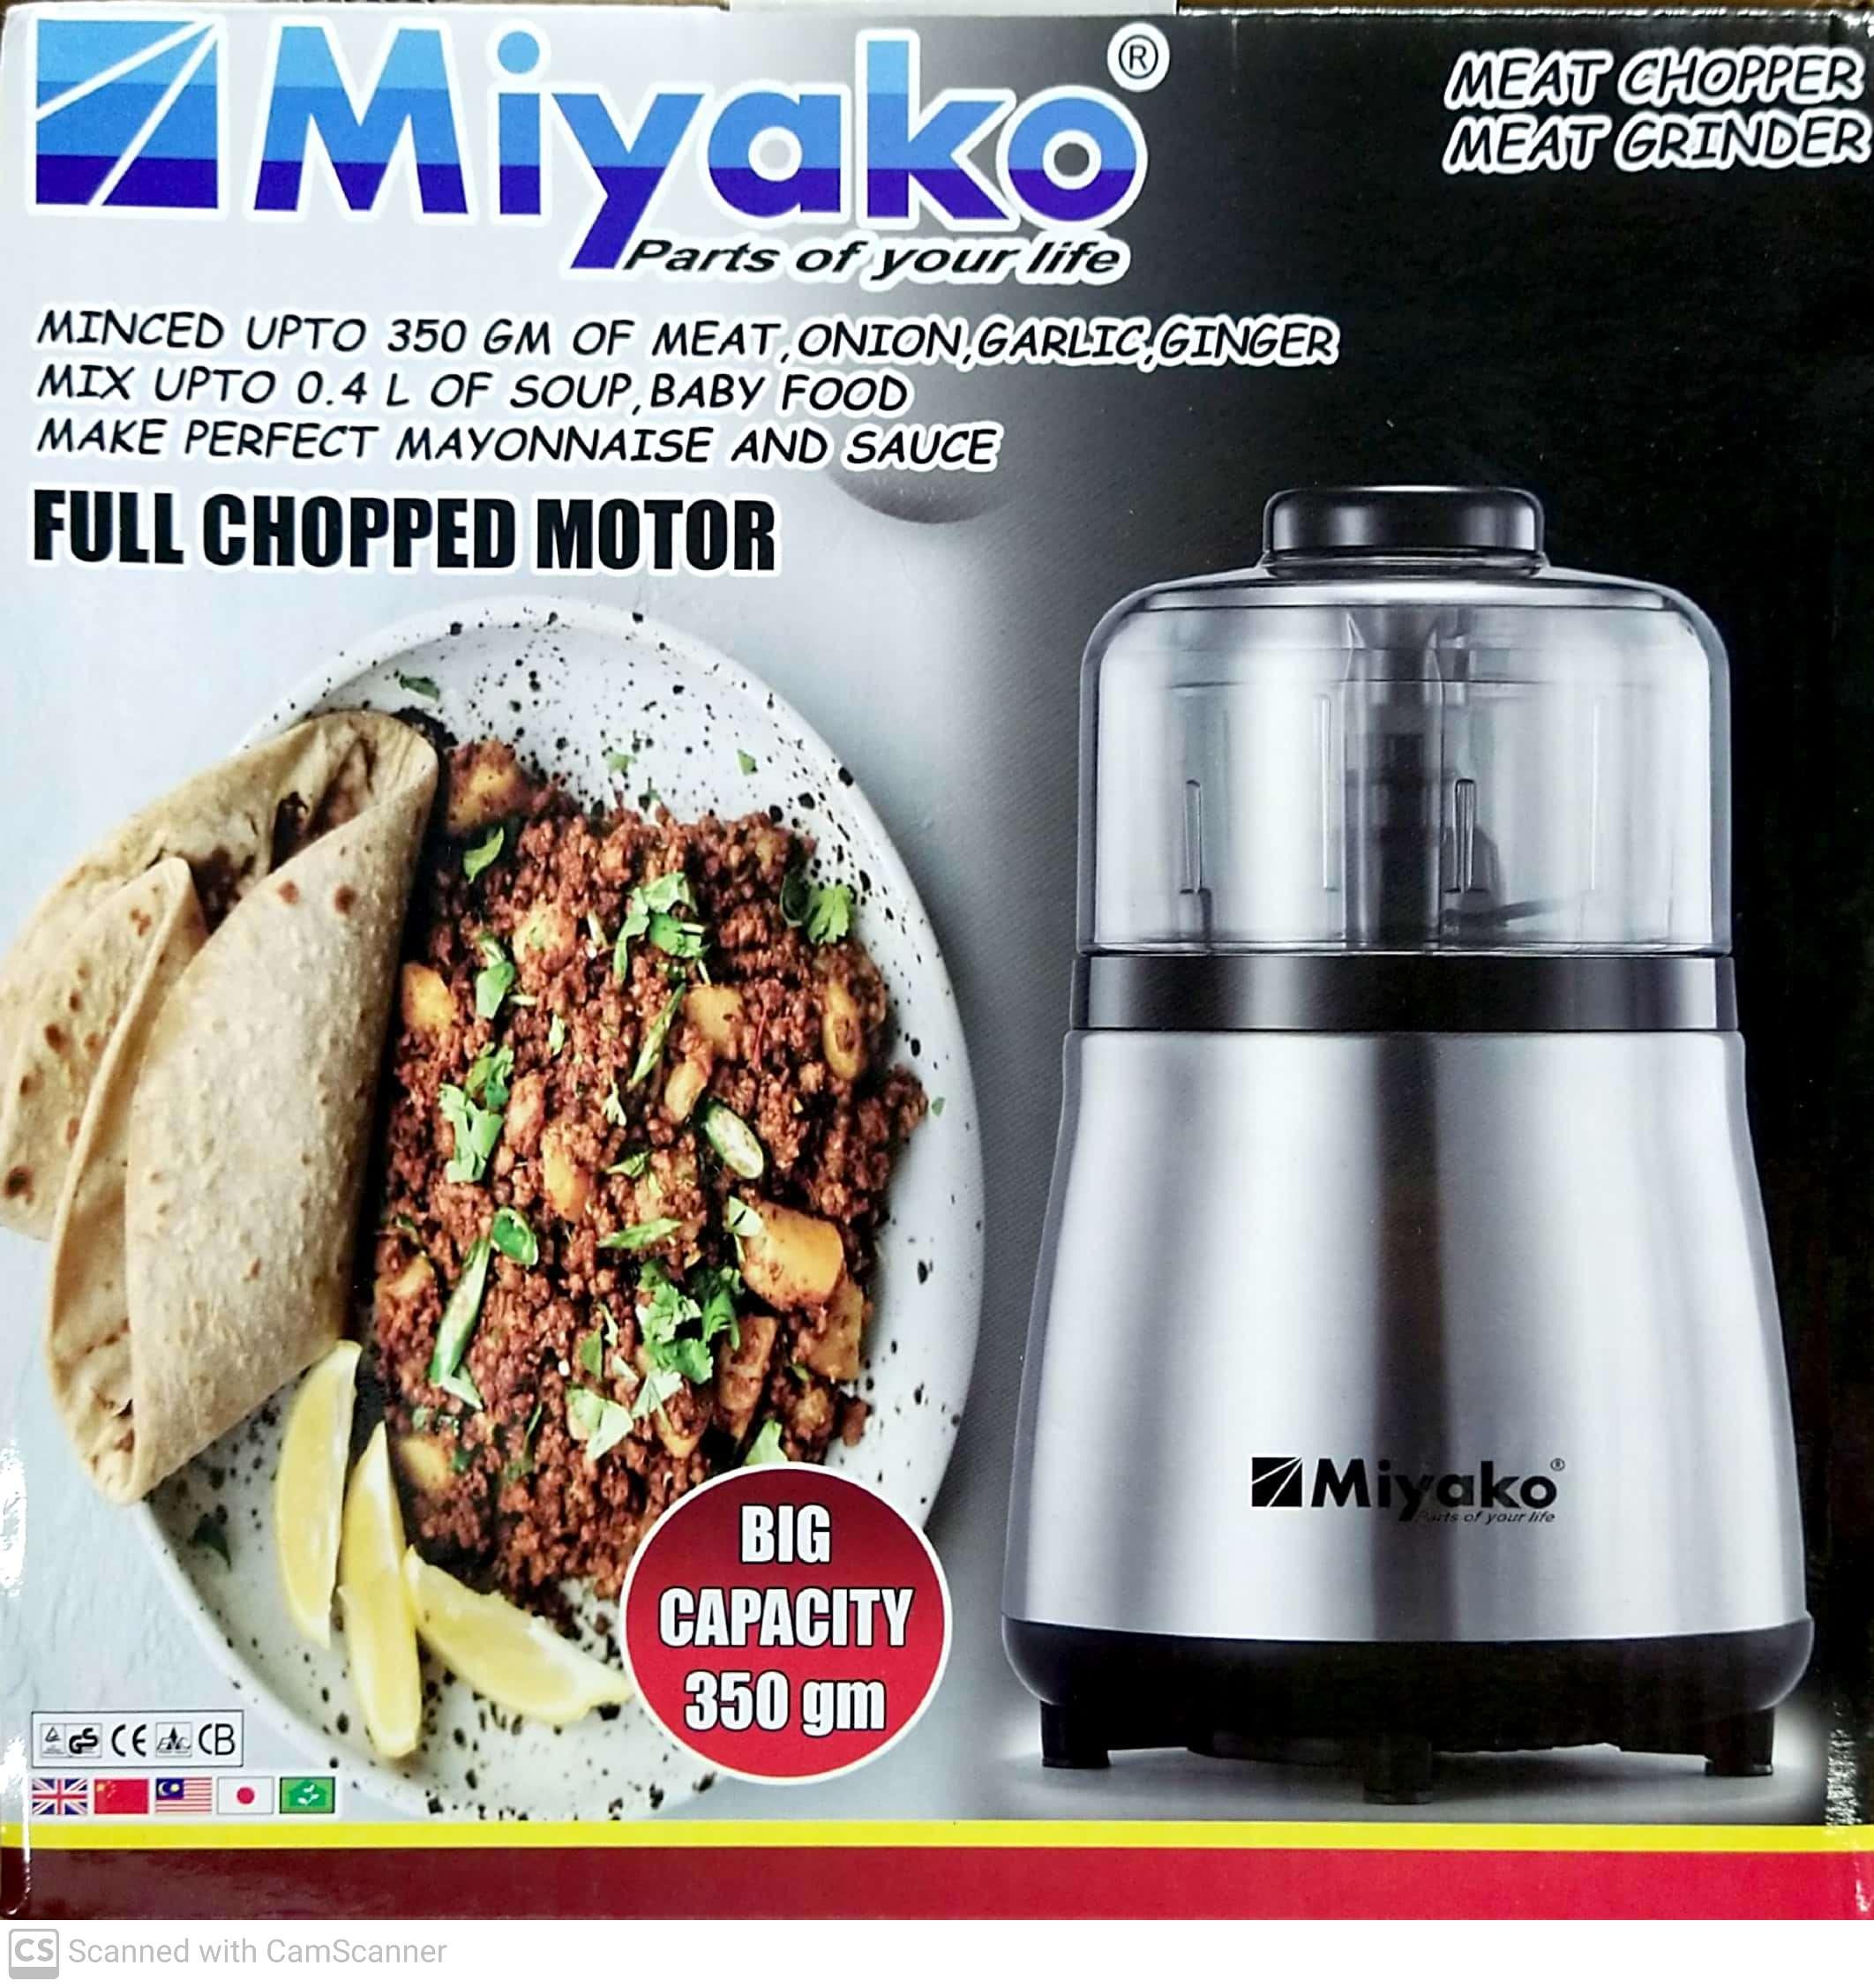 MIYAKO Meat Chopper & Meat Grinder - 350gm